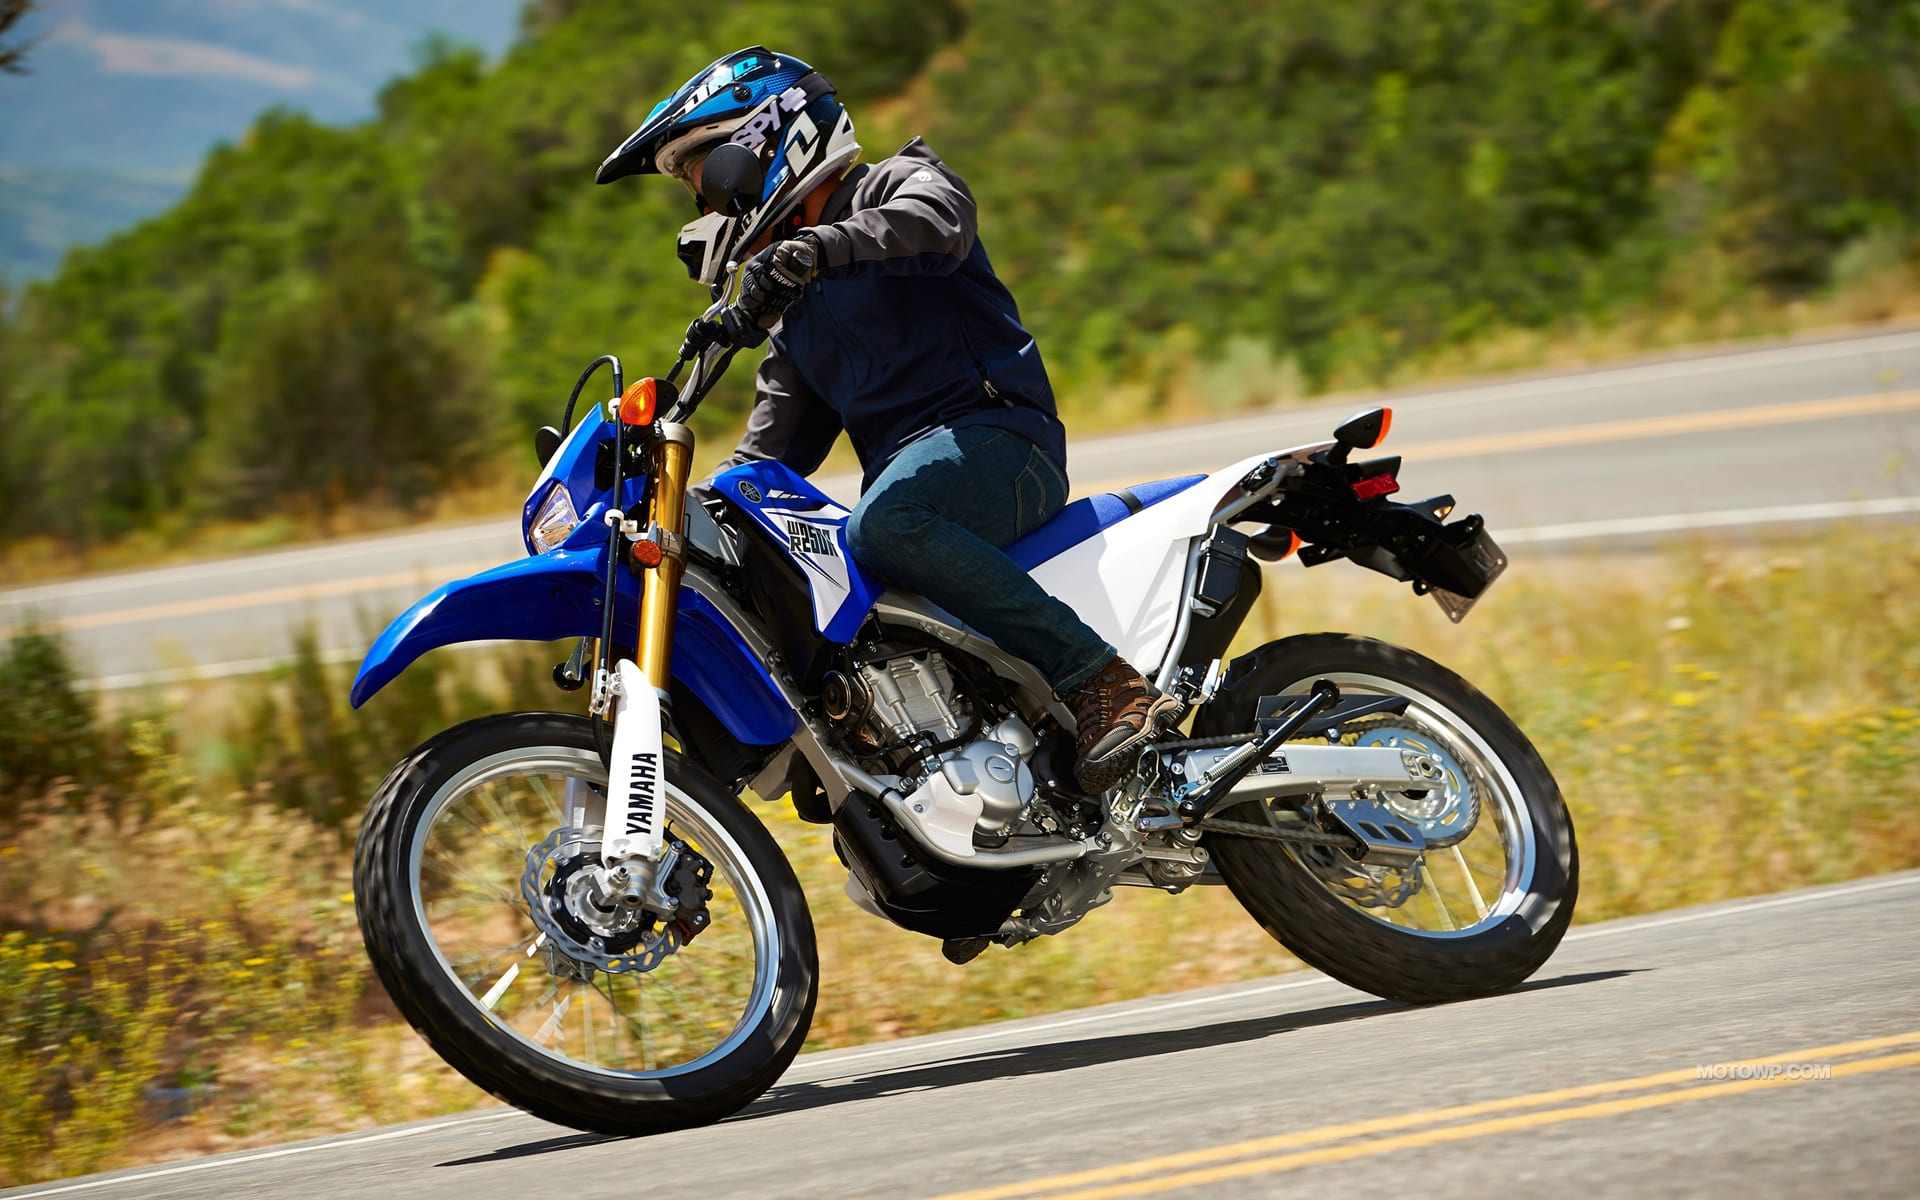 2014-2016 Yamaha WR250 Clutch Lever Recall